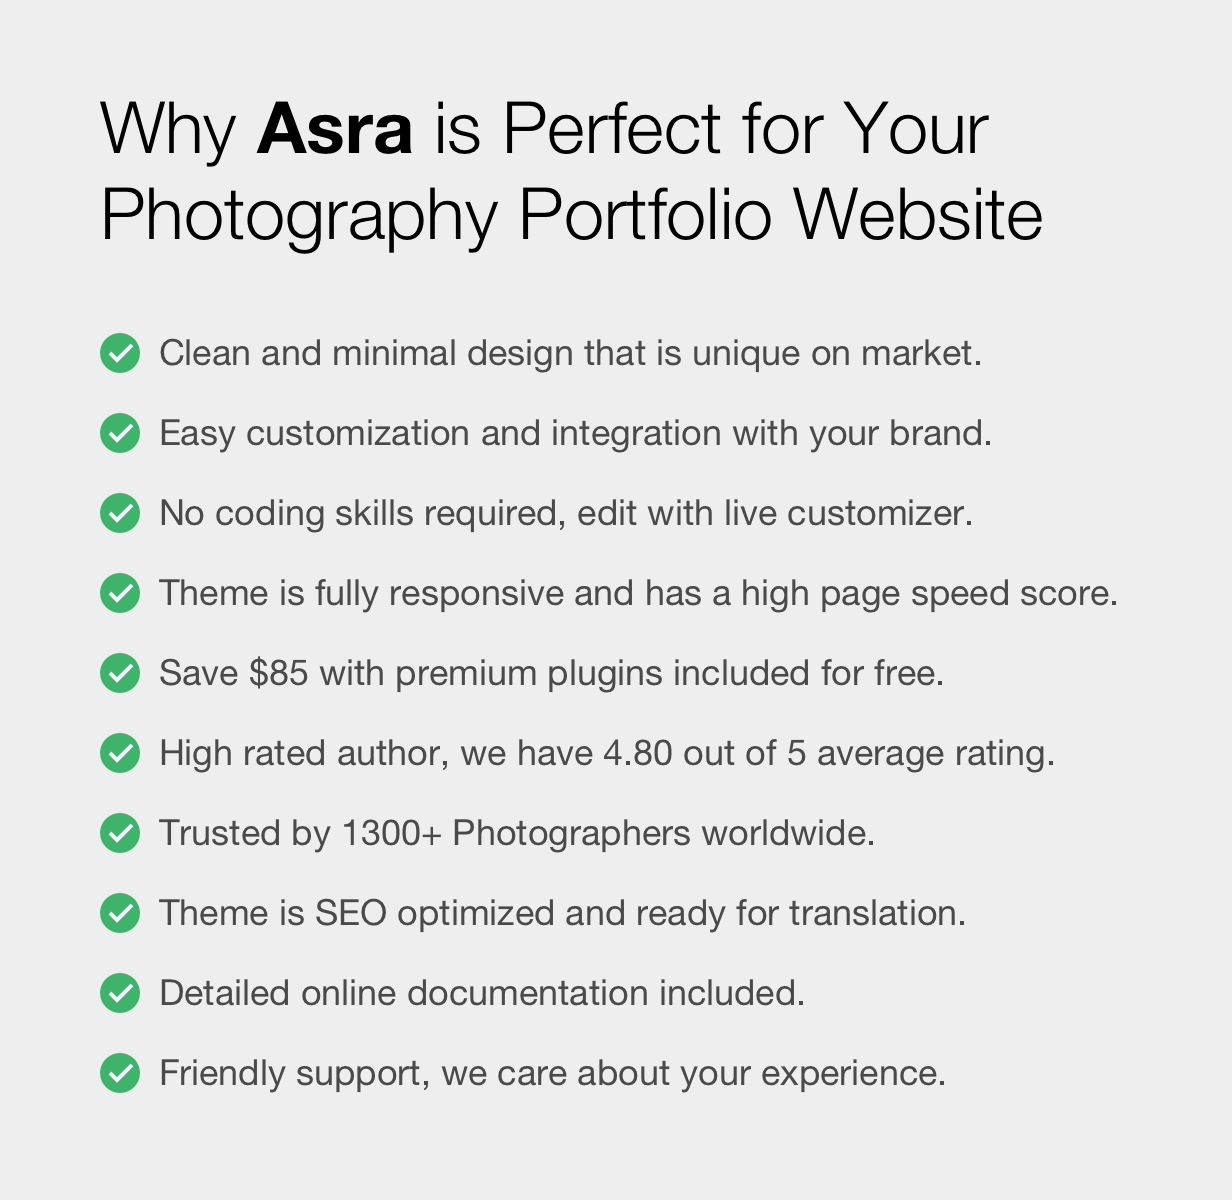 Asra - Minimalistisches Fotografie-Portfolio WordPress-Template - 3